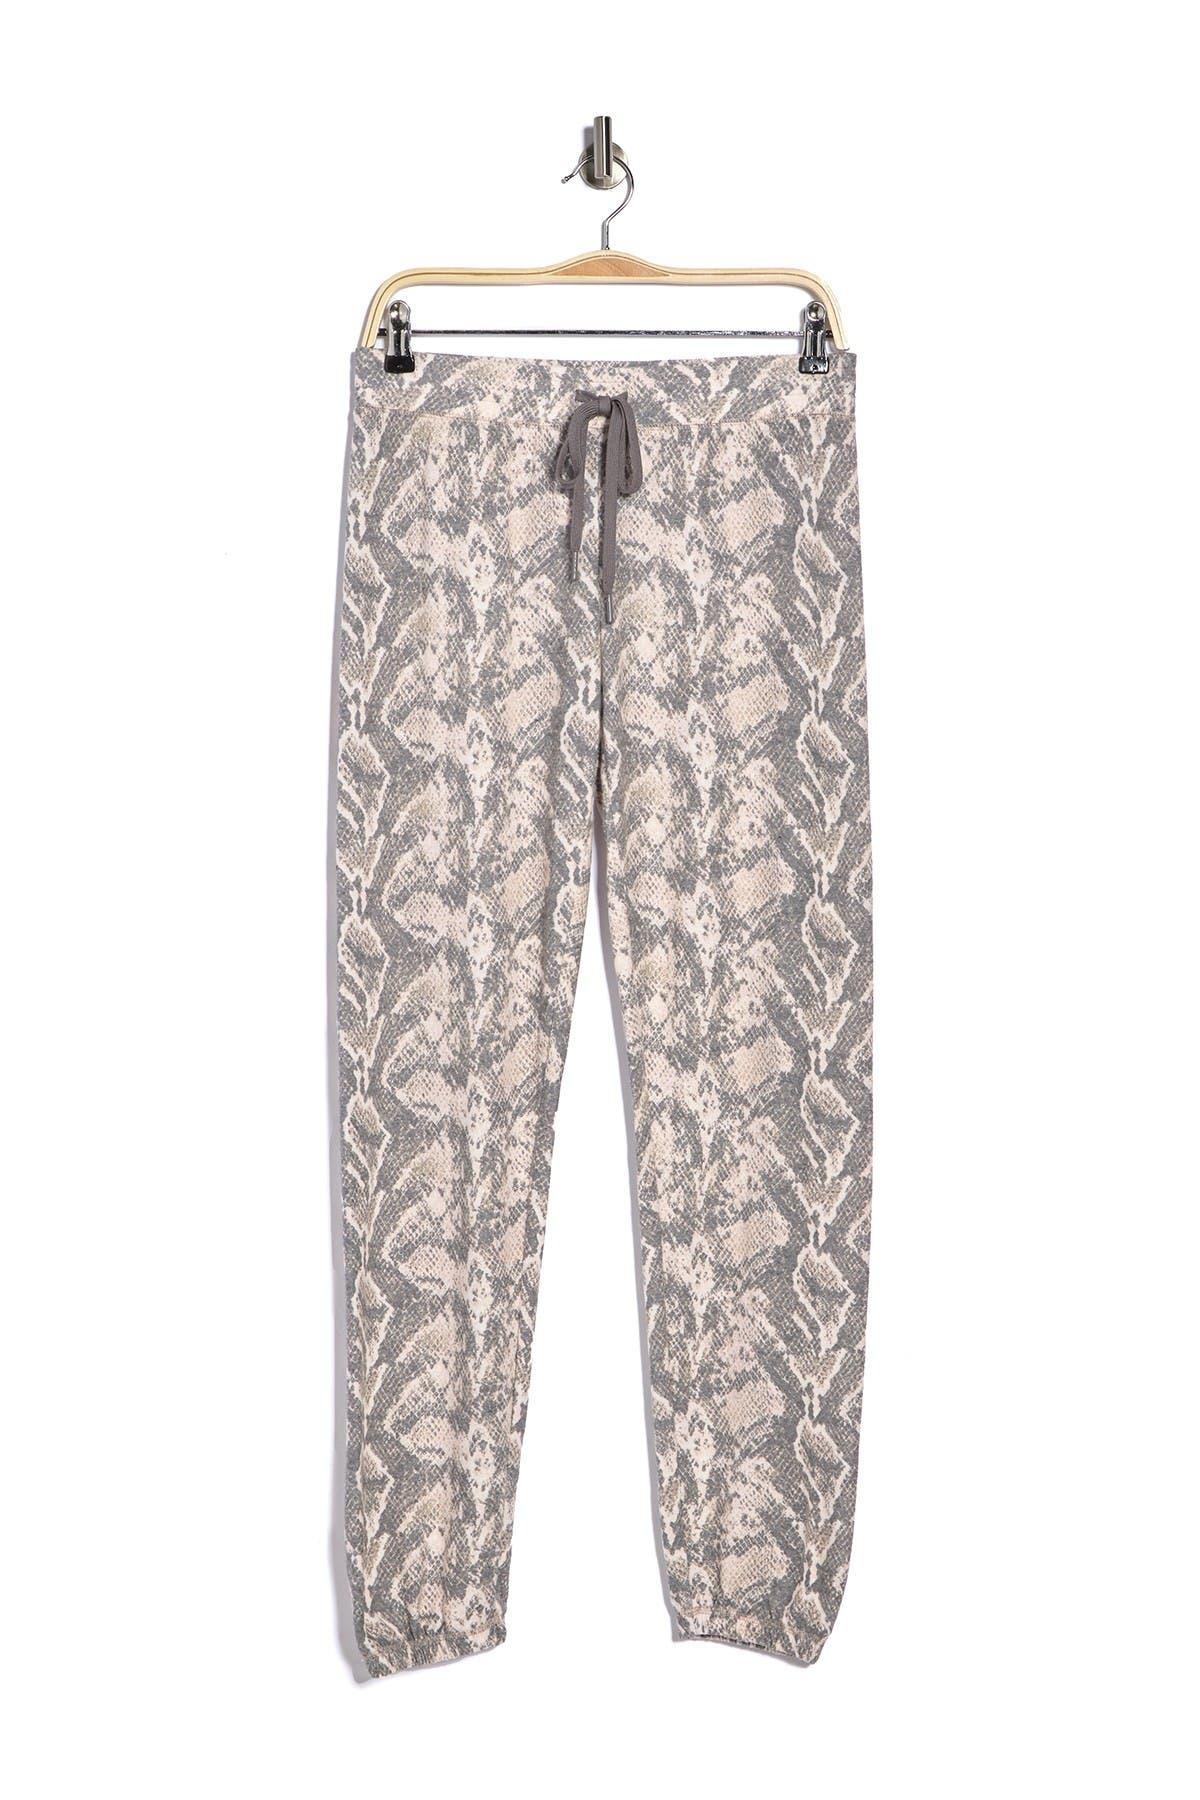 PJ SALVAGE Printed Lounge Pants